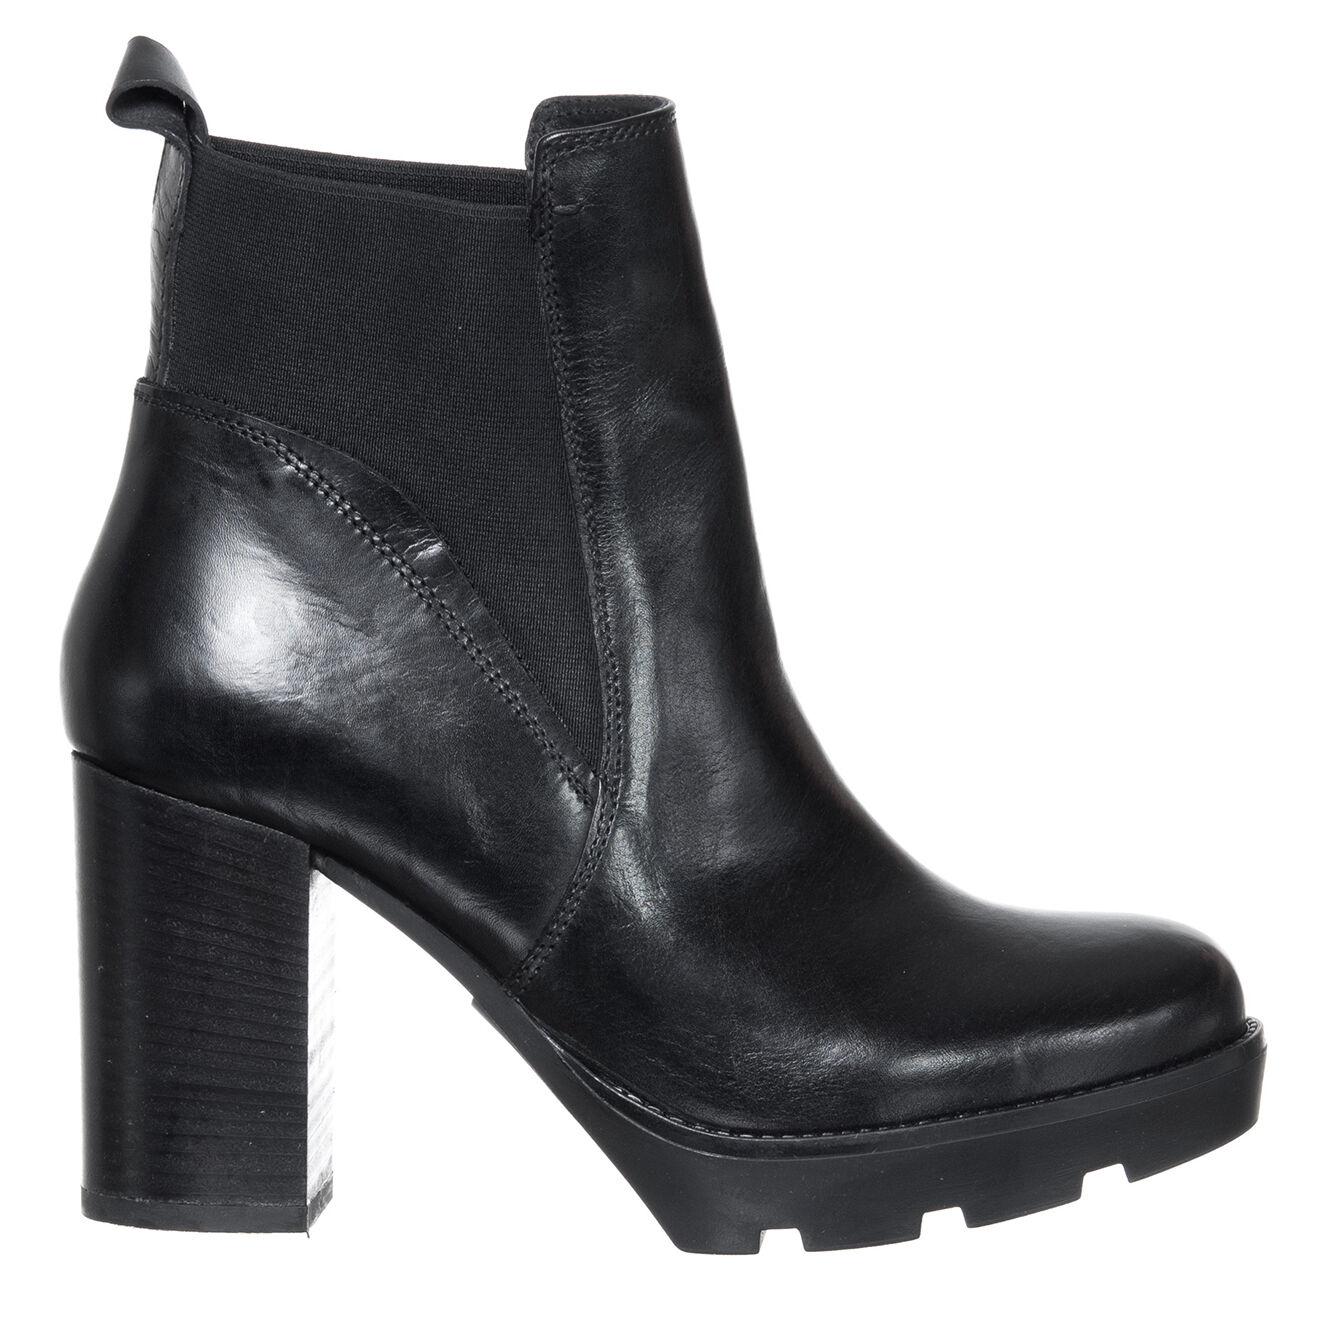 Chelsea boots en Cuir Camille noires - Talon 11 cm - Loretta by Loretta - Modalova